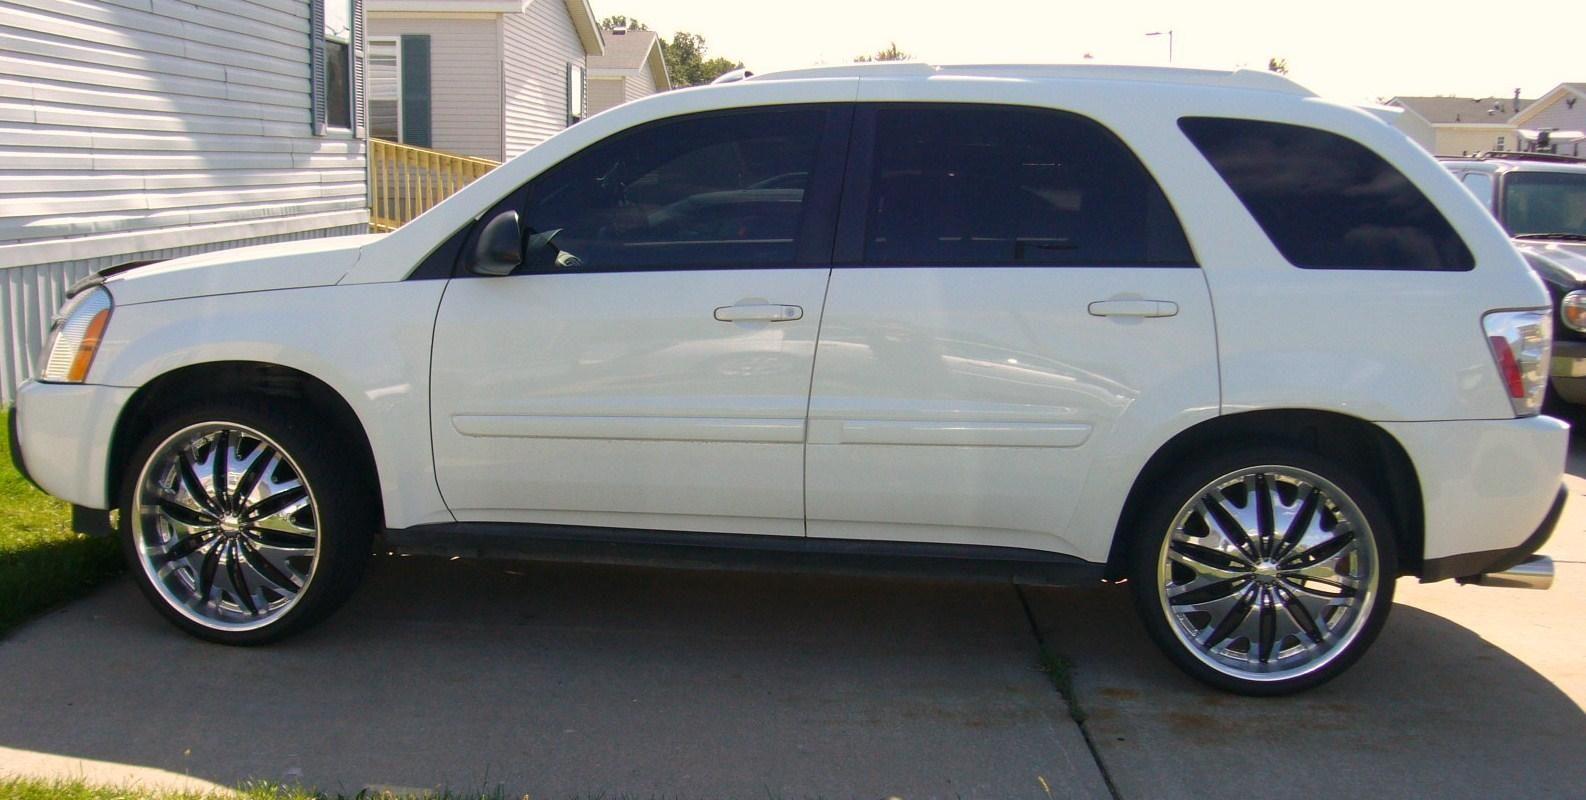 Chevy Equinox Sport Rims 38439200001 Original Jpg V 1 Chevrolet Captiva Sport Chevrolet Equinox Chevrolet Captiva